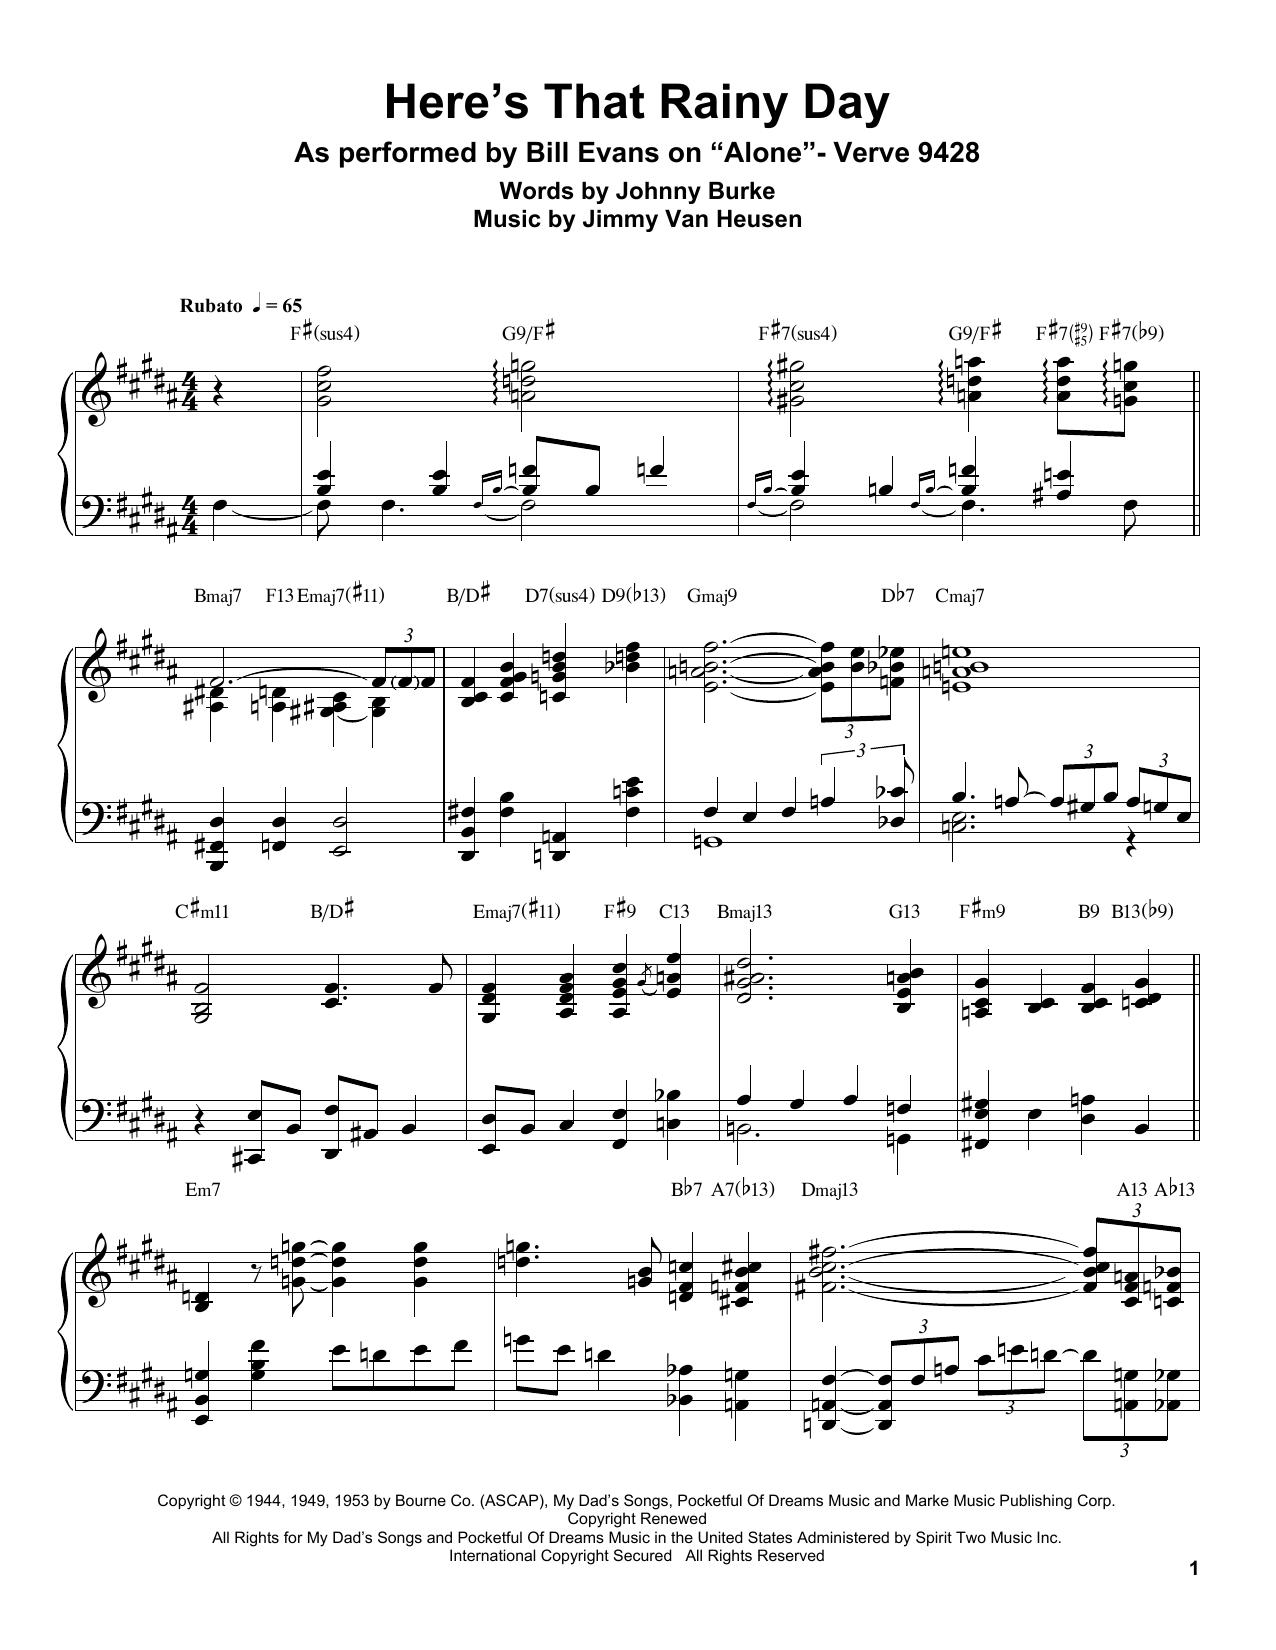 Here's That Rainy Day Sheet Music